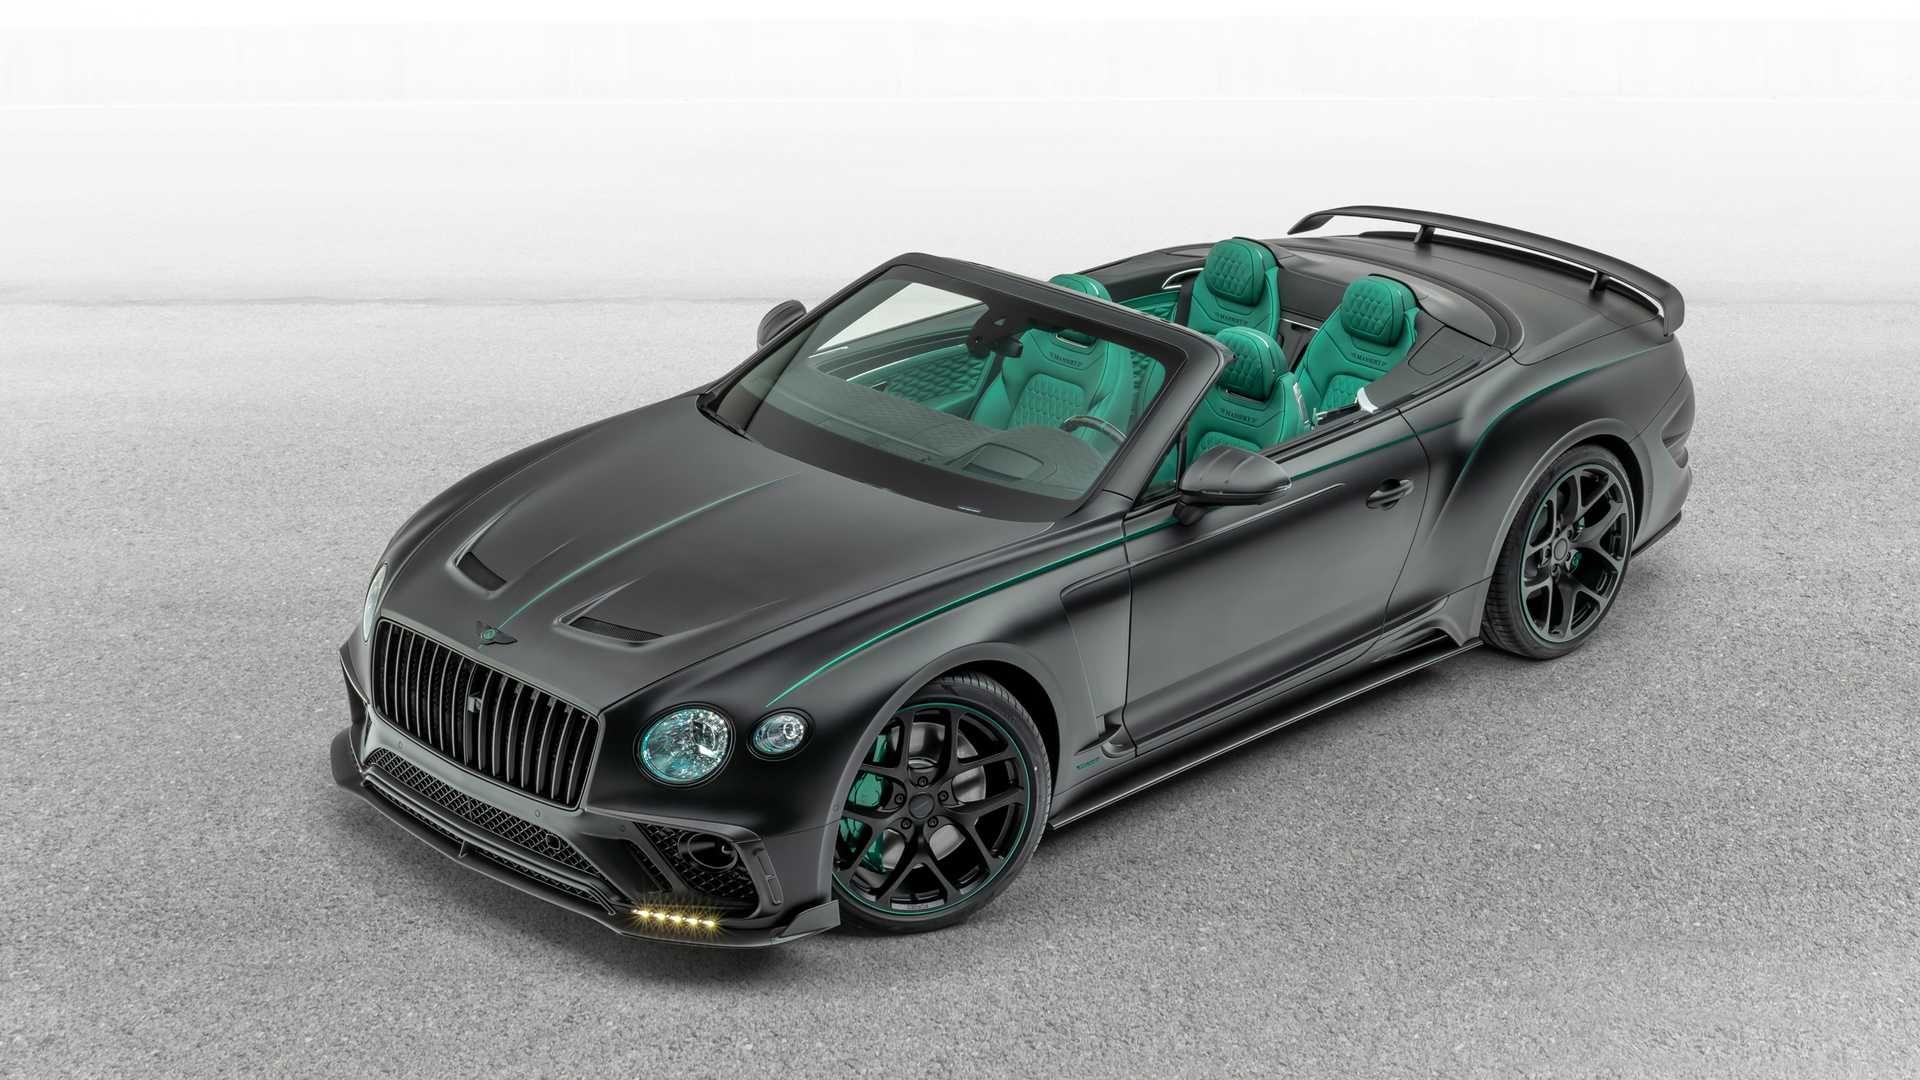 Bentley-Continental-GTC-V8-Cabriolet-Mansory-6